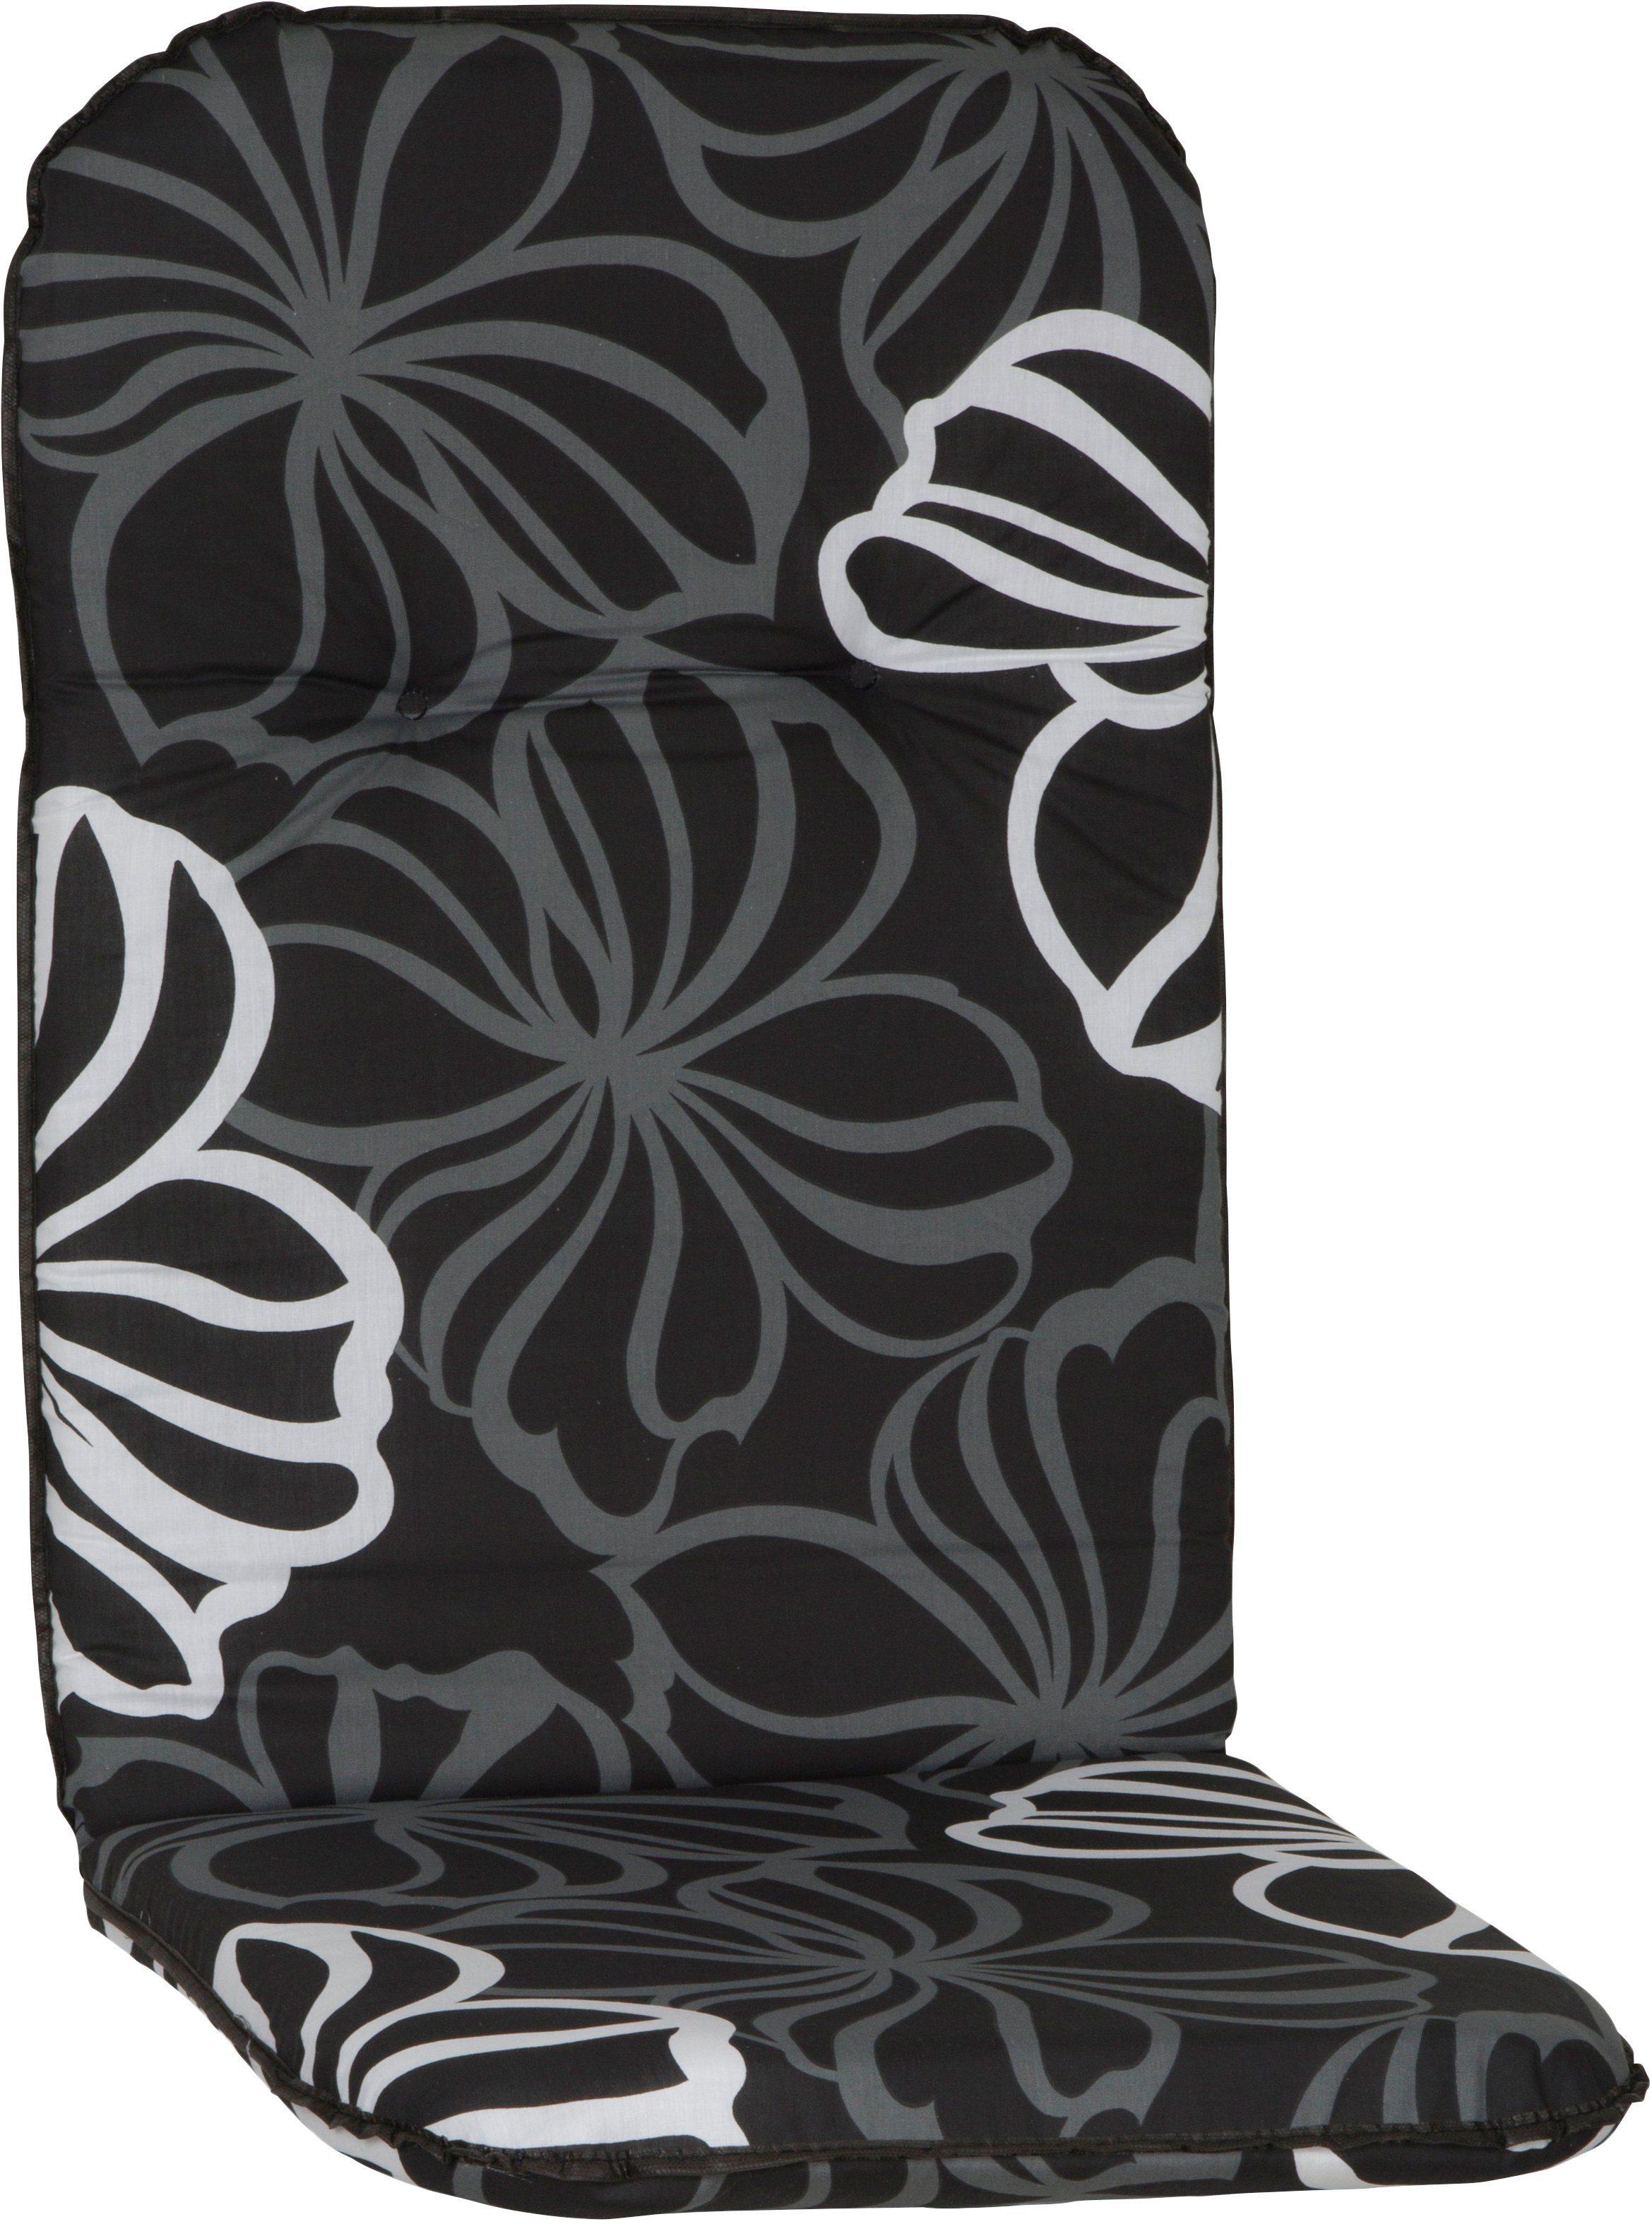 Hochlehnerauflage »Bali«, (4er Set), (L/B): ca. 115x48 cm